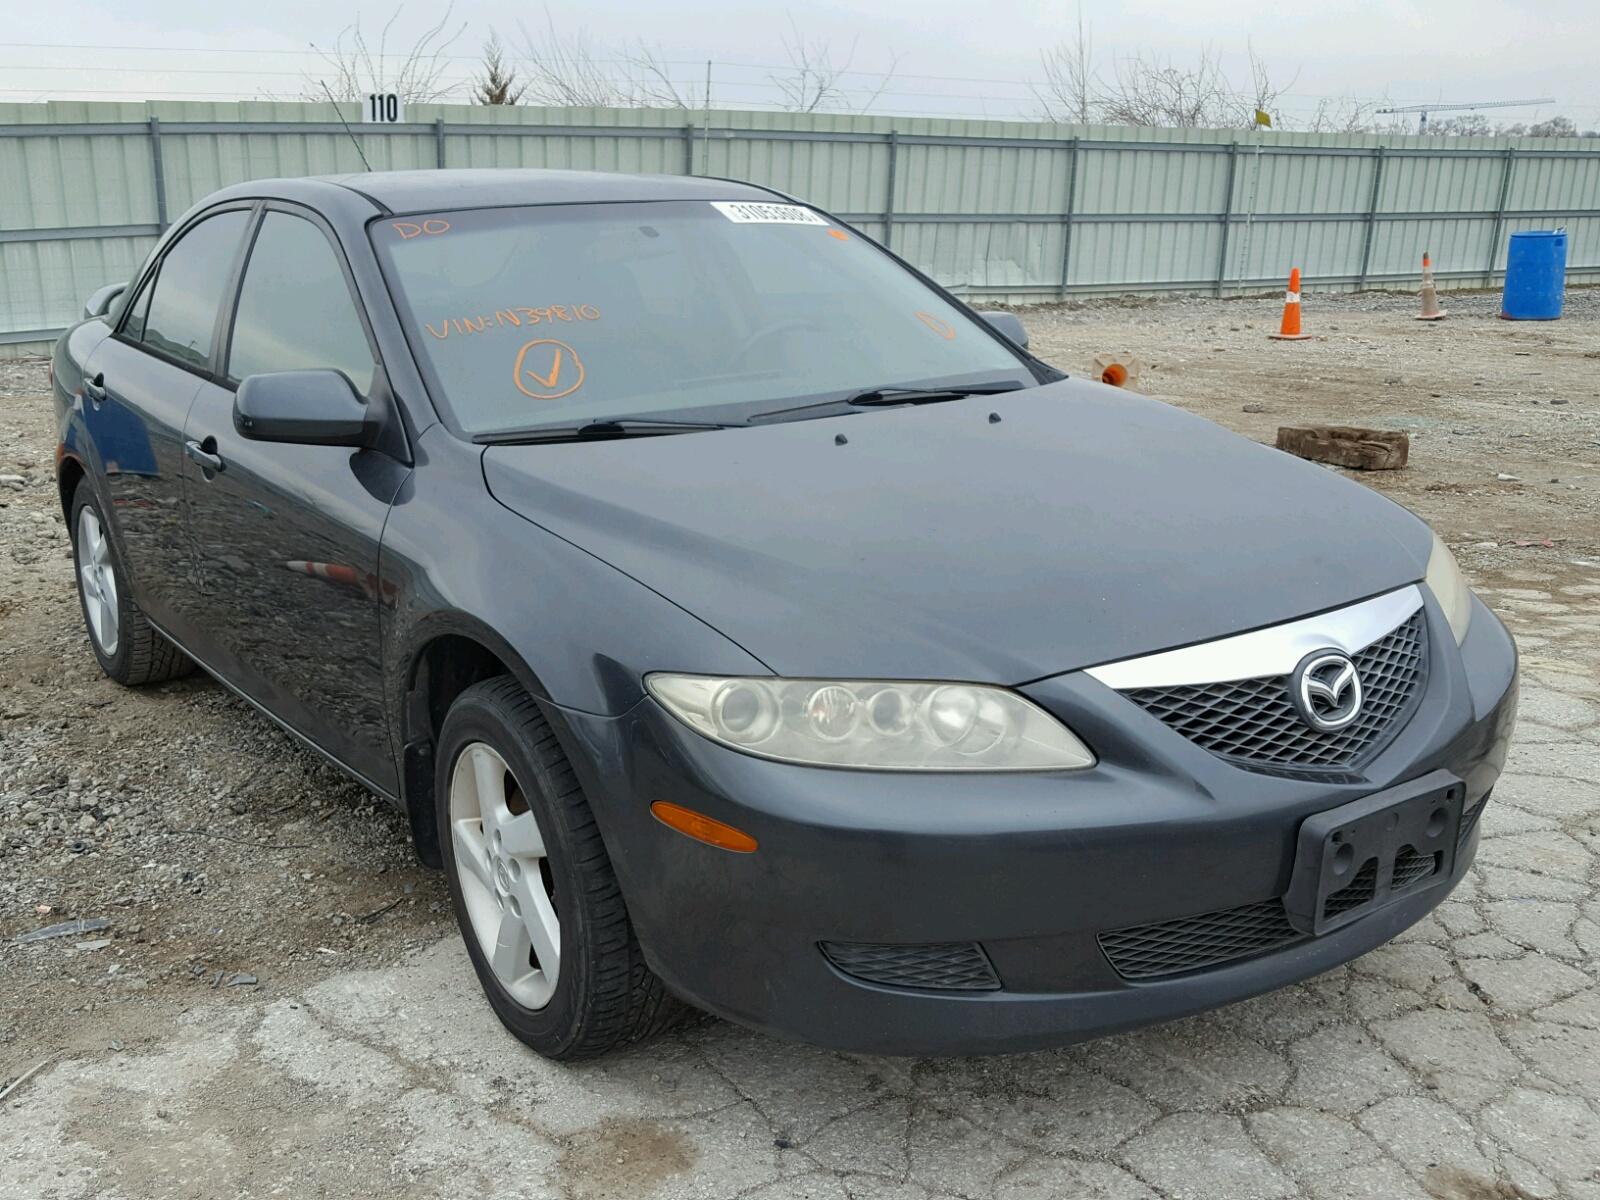 inside mazda online carfinder dealer auto sale city black s in title kansas clean view on en auctions ks lot copart only